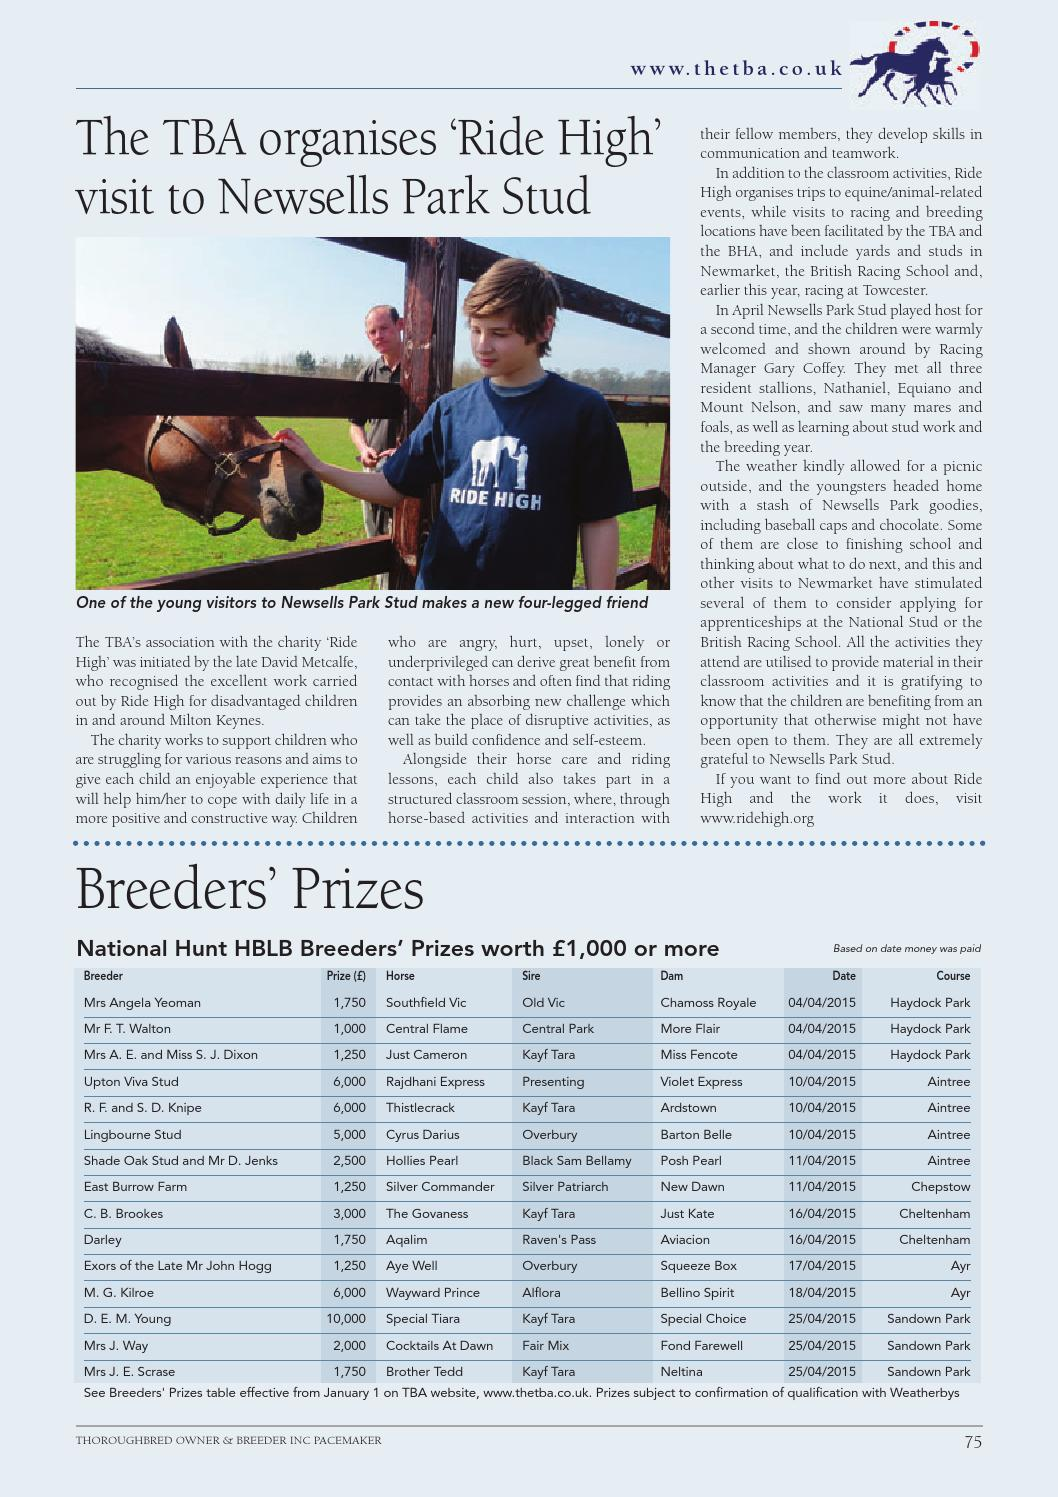 Hblb breeders prizes for kids